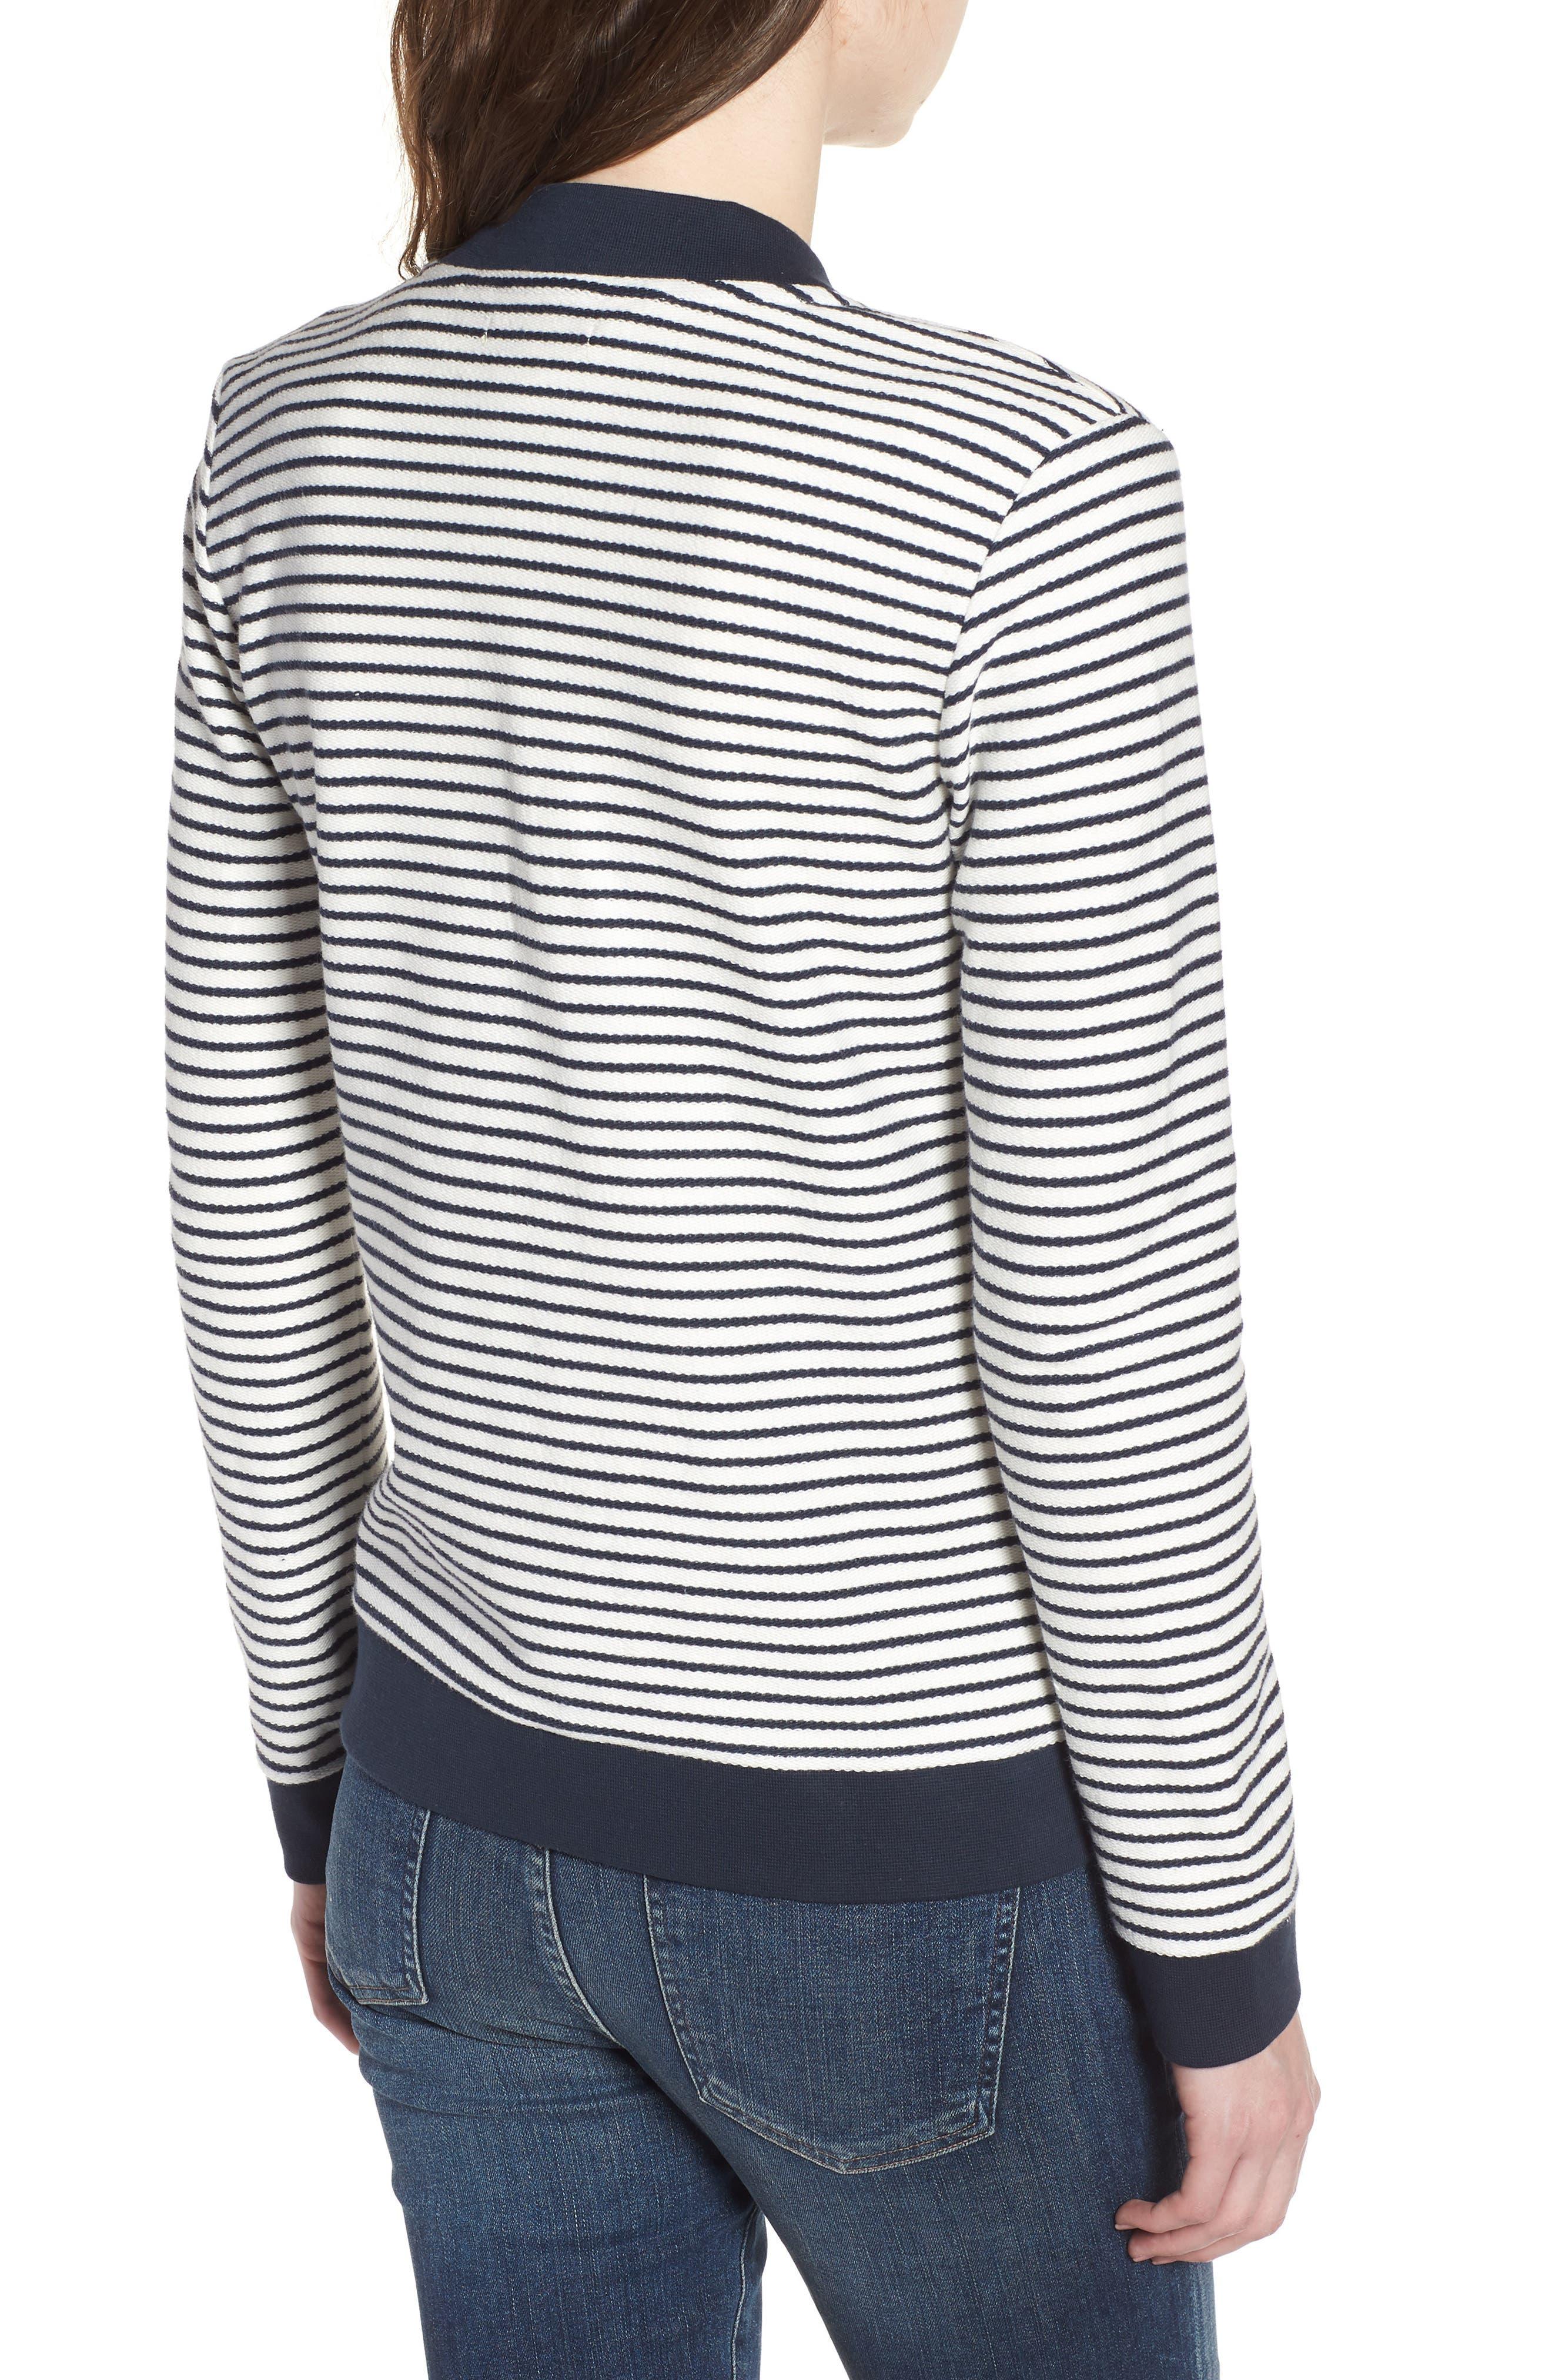 Bamburgh Sweater Jacket,                             Alternate thumbnail 2, color,                             White/ Navy